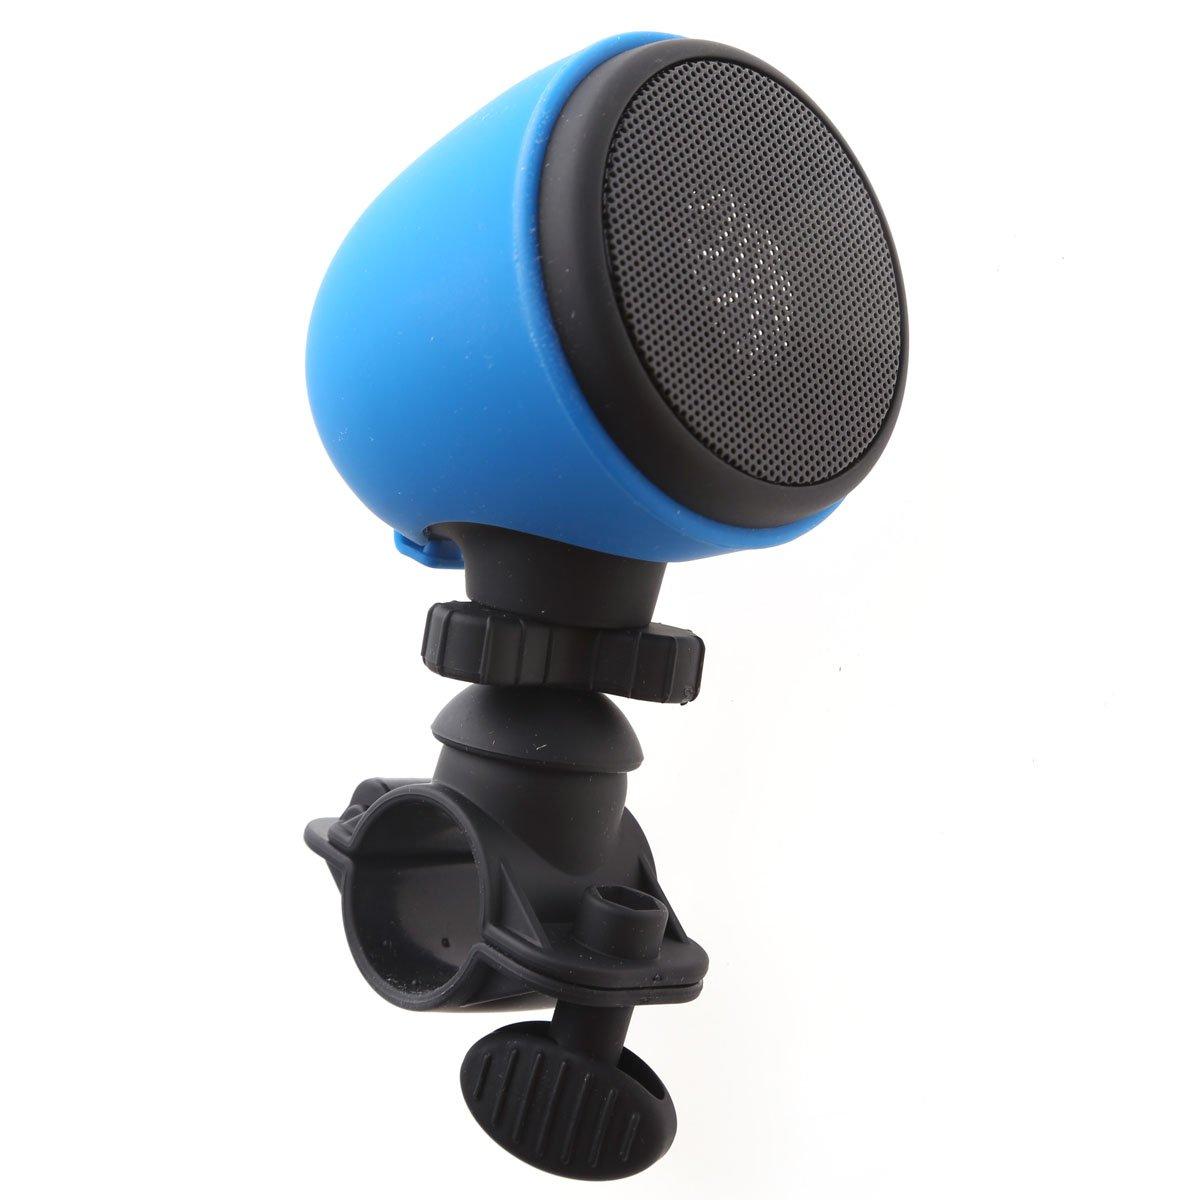 Sonlipo Bluetooth Waterproof Microphone Bicycling Image 1